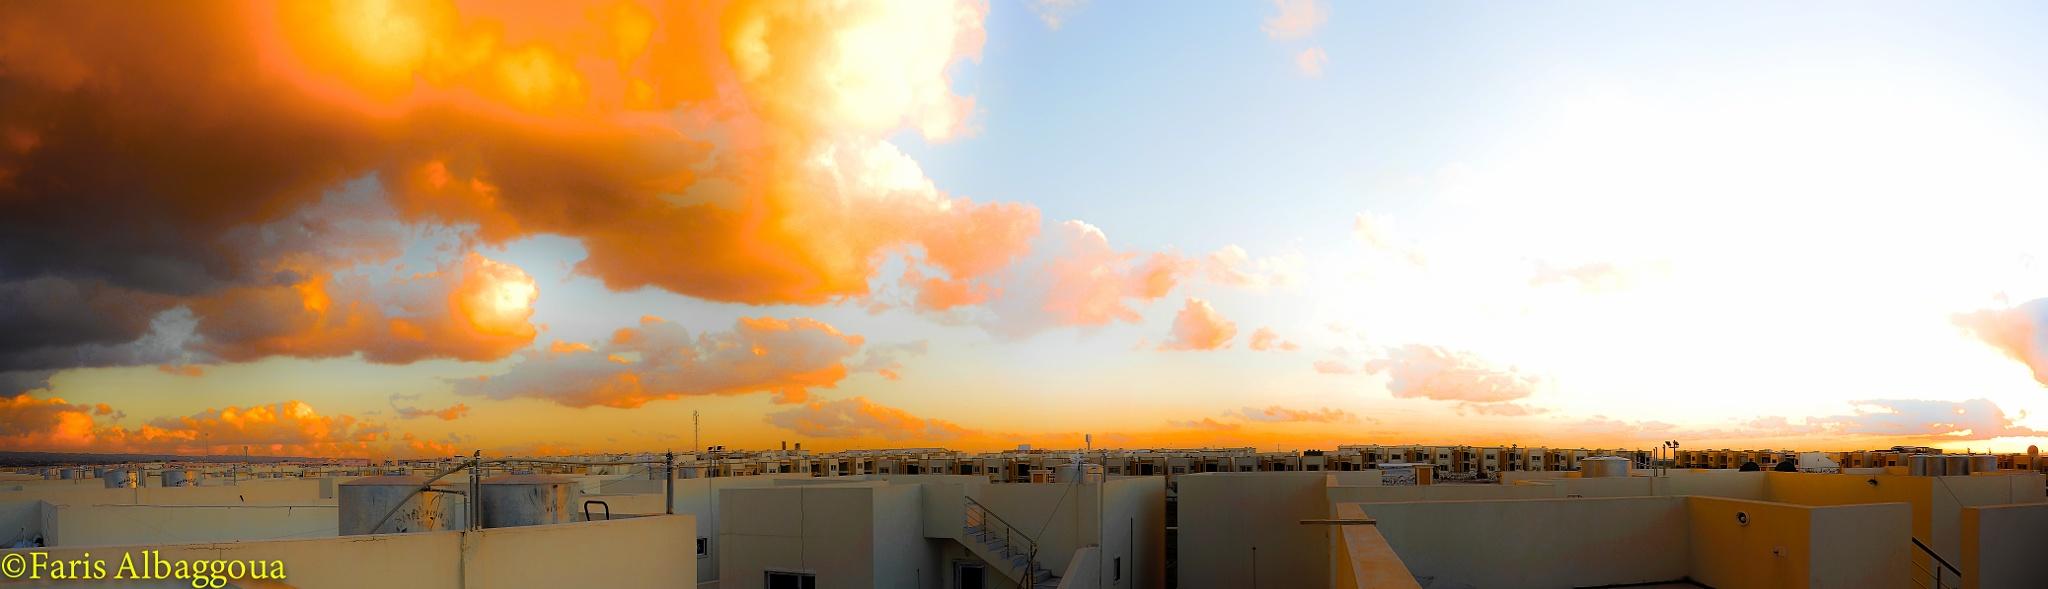 Clouds by  faris albaggoua